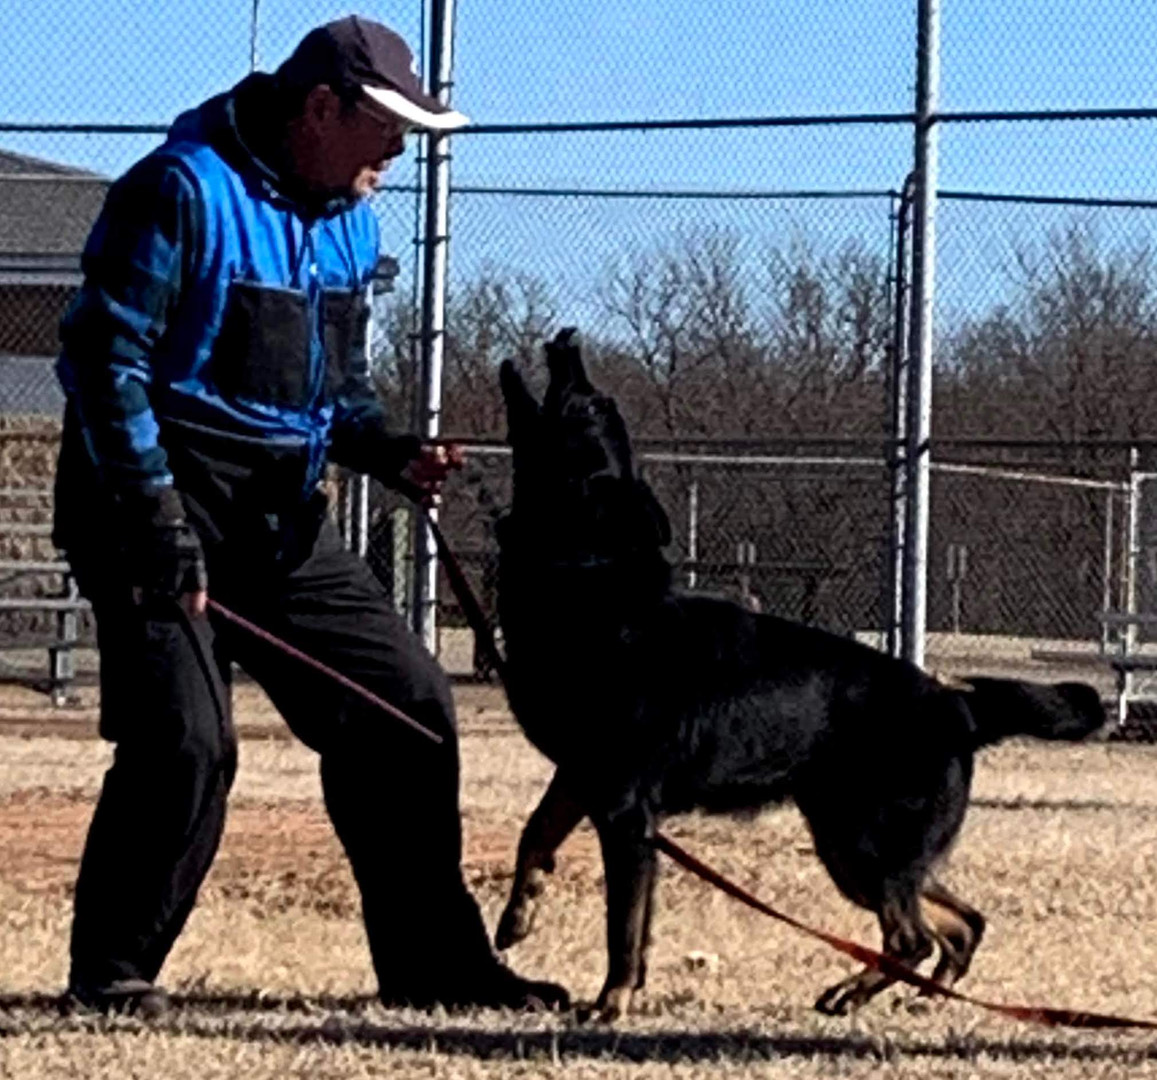 IGP/Schutzhund Trainer, Joseph LIn, & Armus Vom Boomerbucht BH, IPO1, IGP2 (Earned at Regionals), IGP3 Czech, Working-line German Shepherd